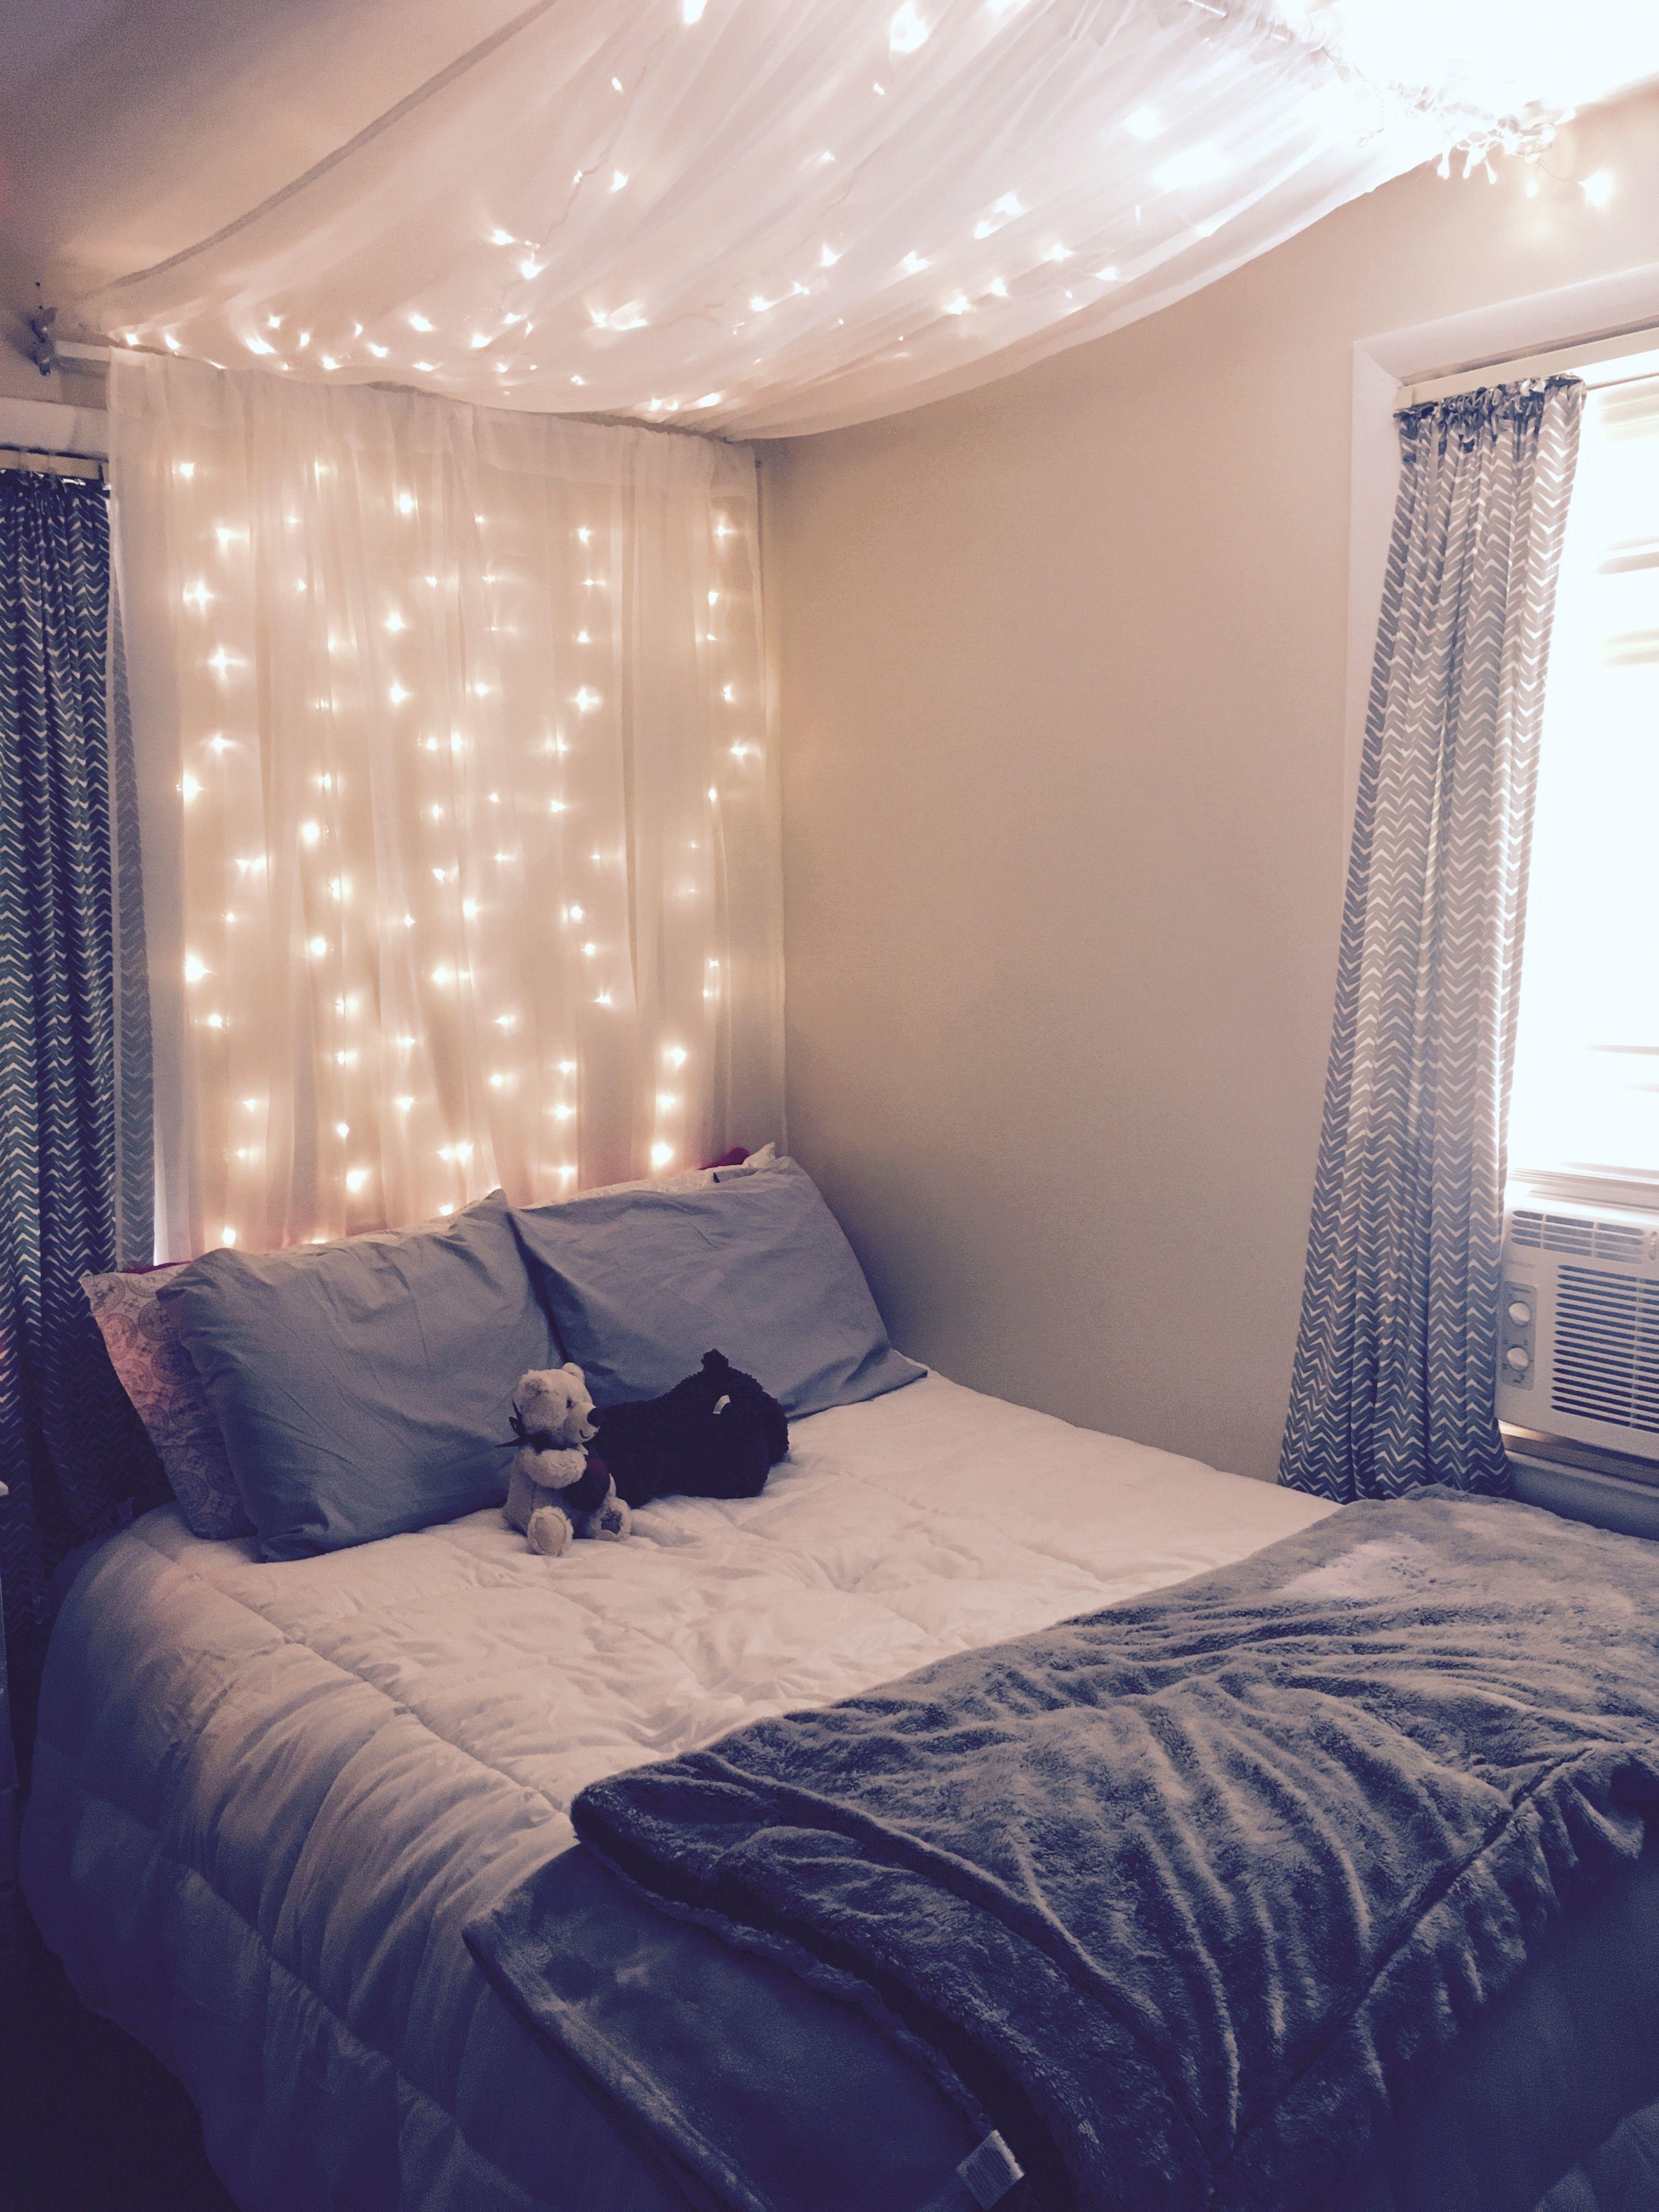 caribbean gold home decor pinterest ideen f rs zimmer schlafzimmer und zimmerdeko. Black Bedroom Furniture Sets. Home Design Ideas